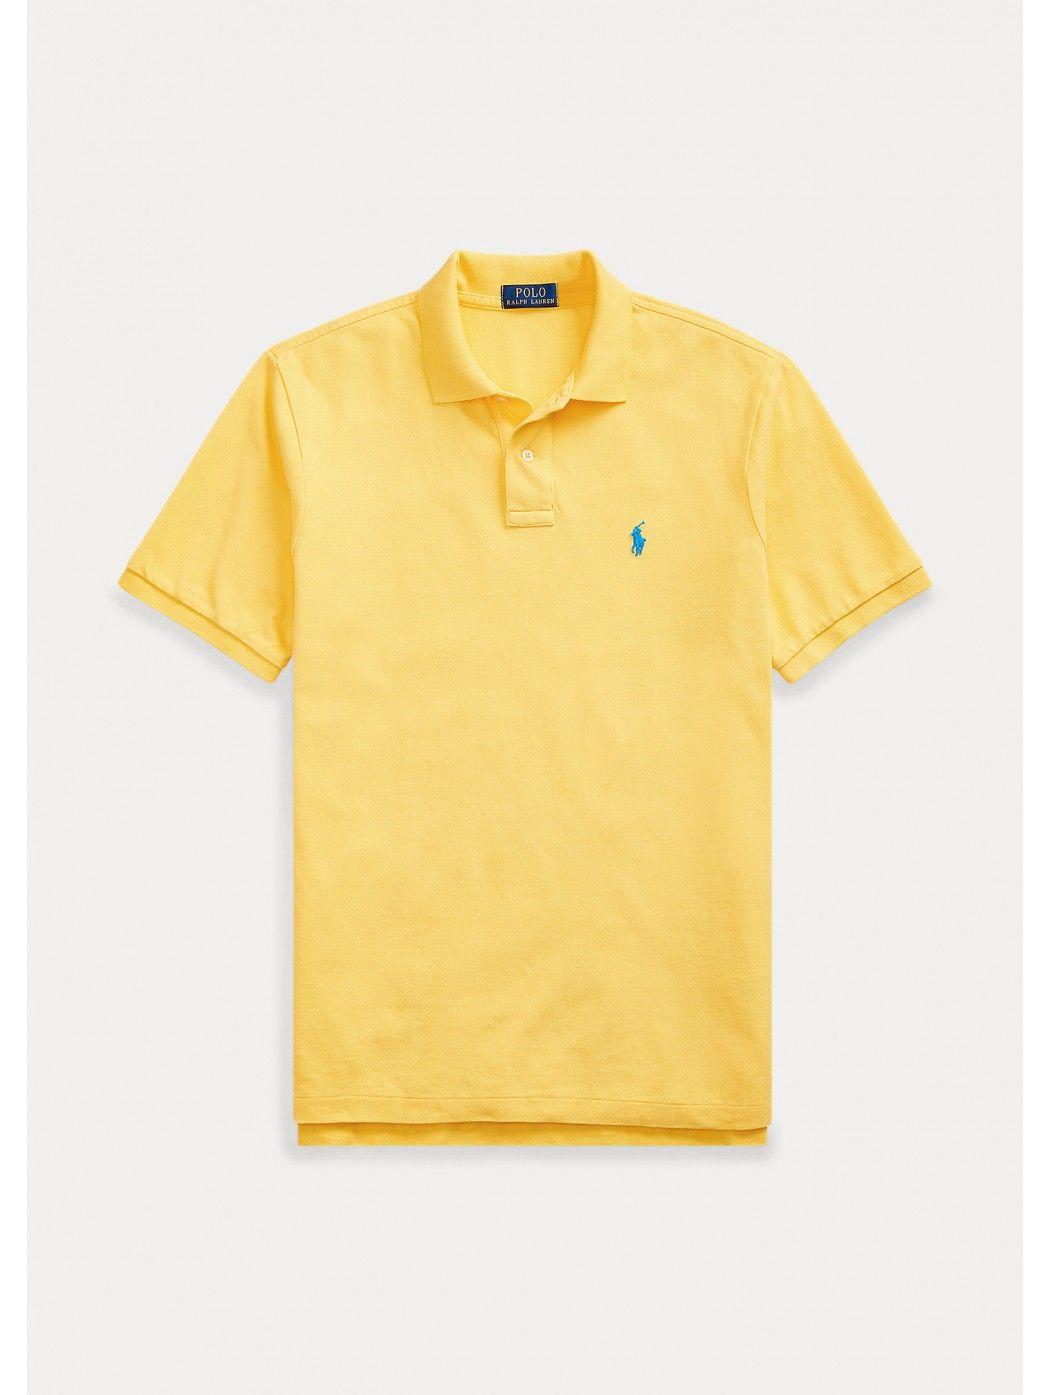 Polo in piqu' Slim-Fit POLO RALPH LAUREN UOMO 710795080 022